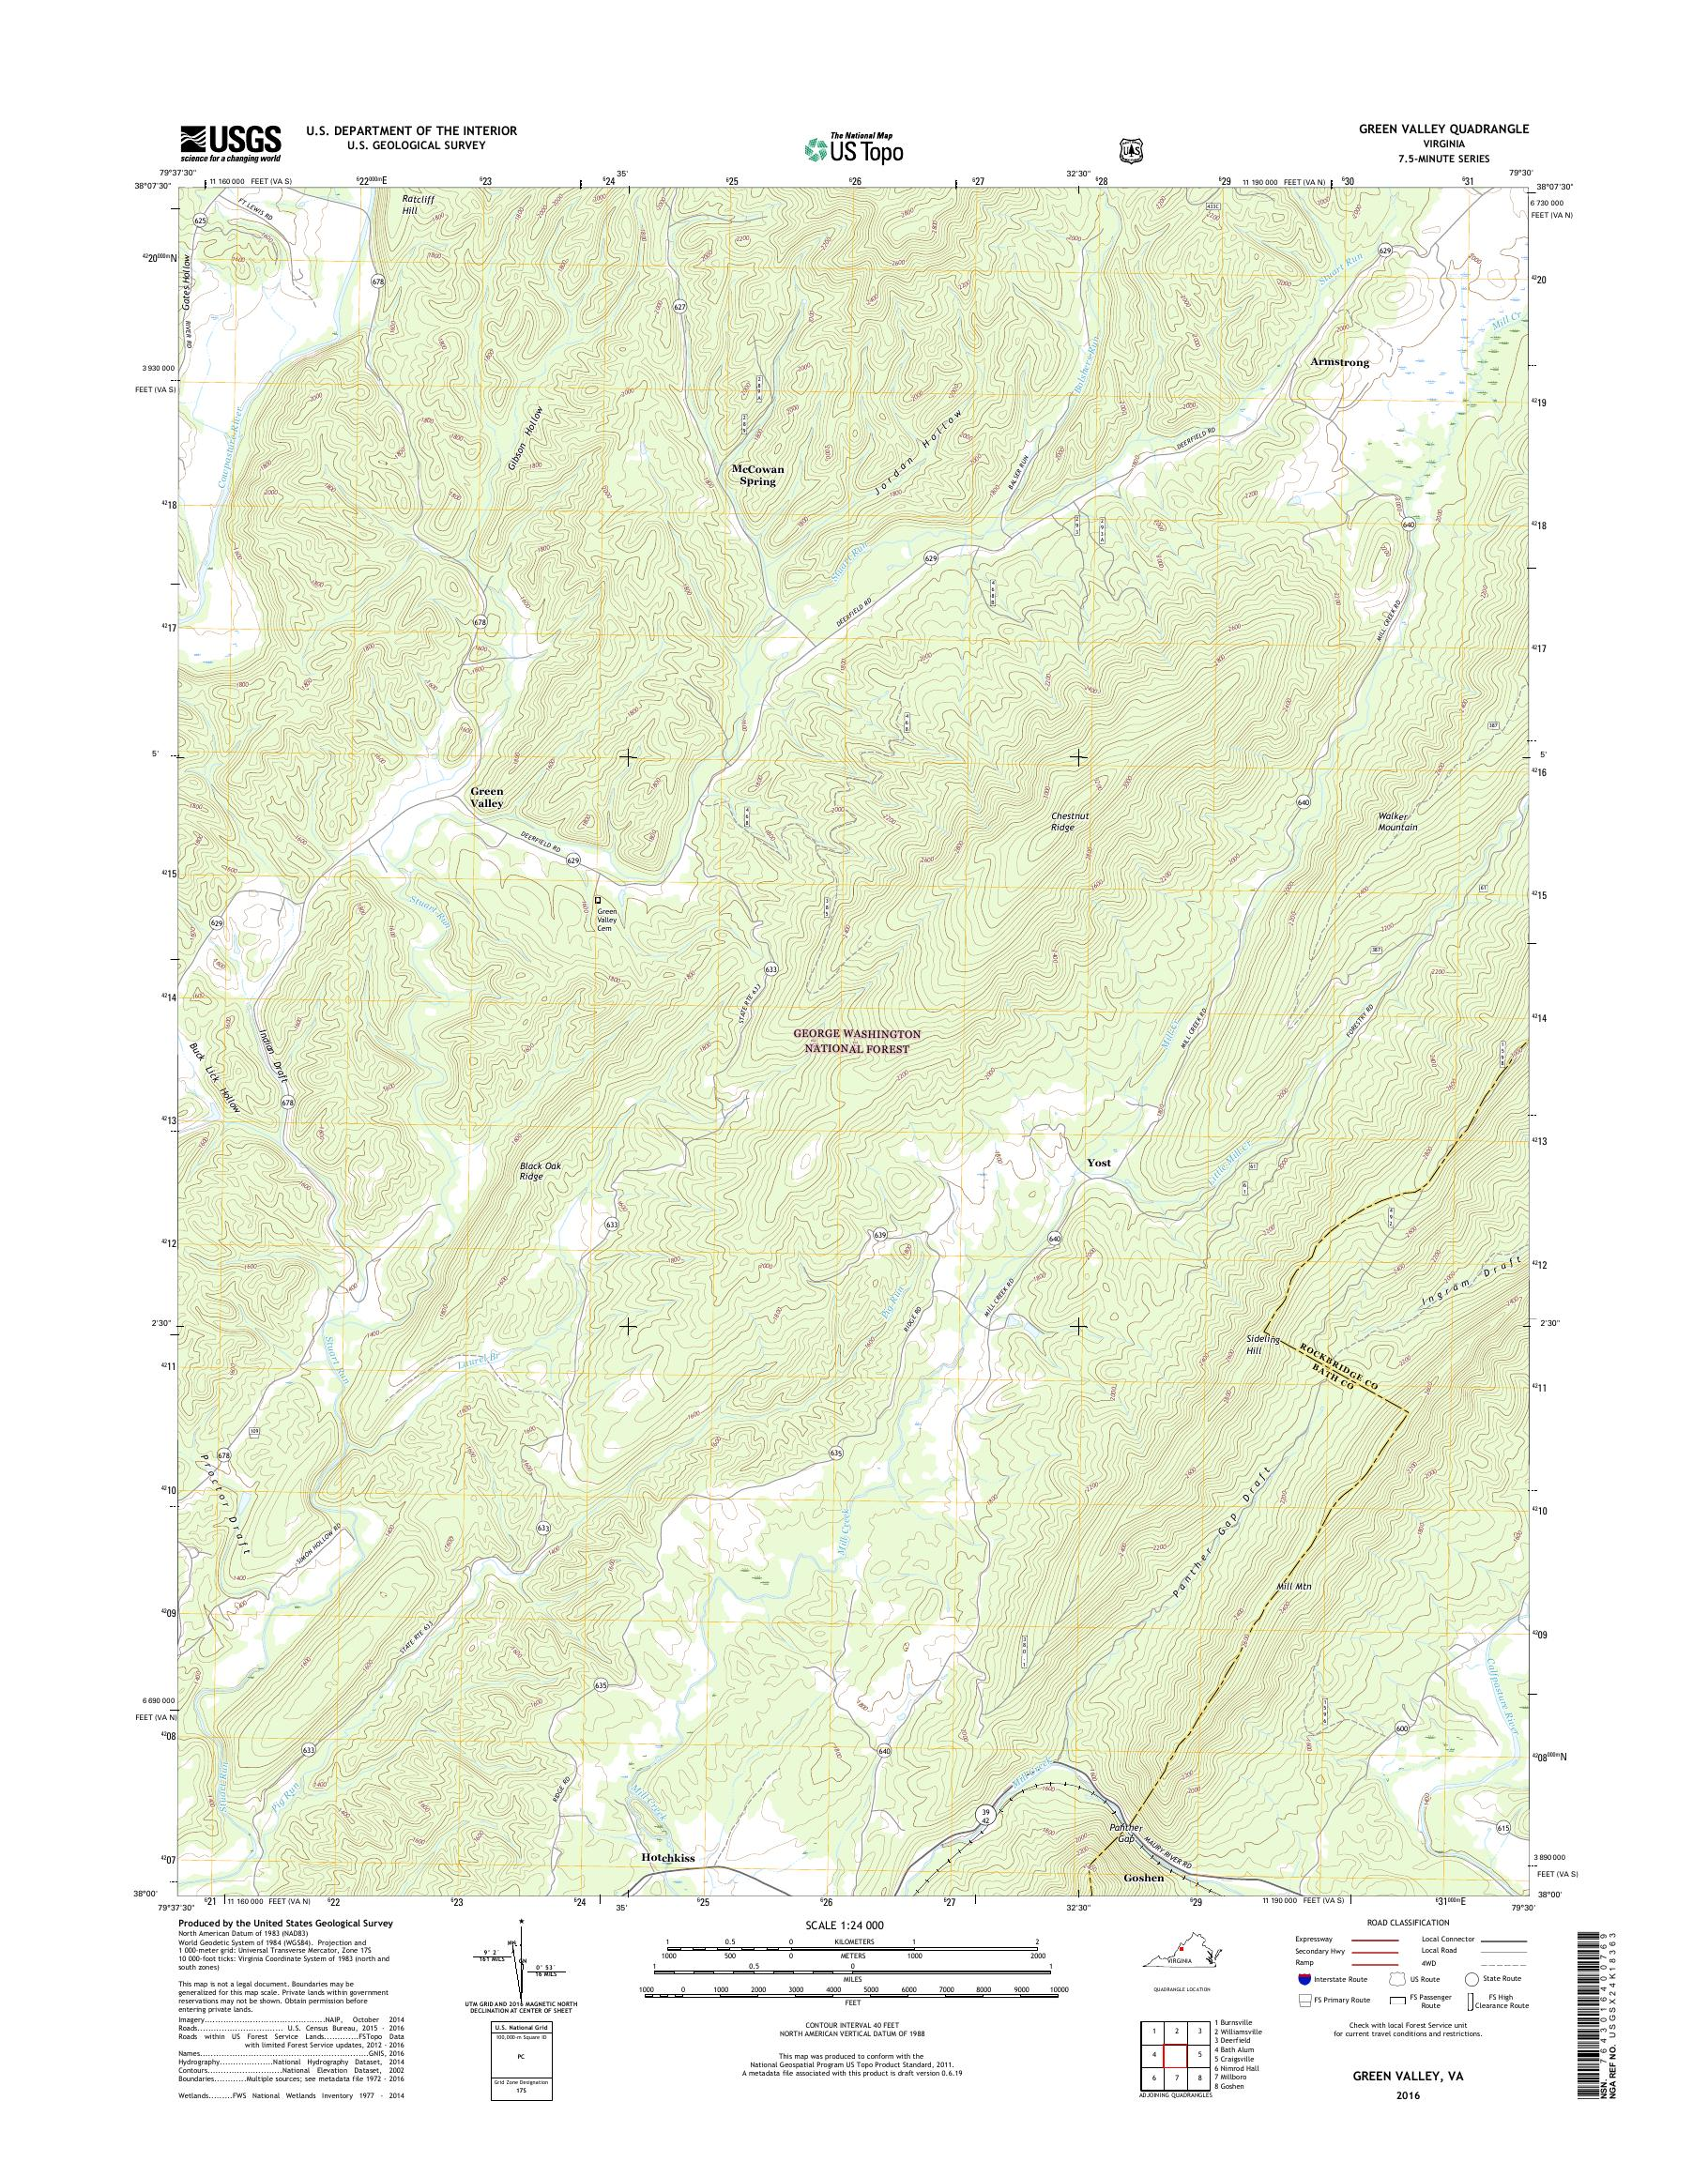 Mytopo Green Valley Virginia Usgs Quad Topo Map